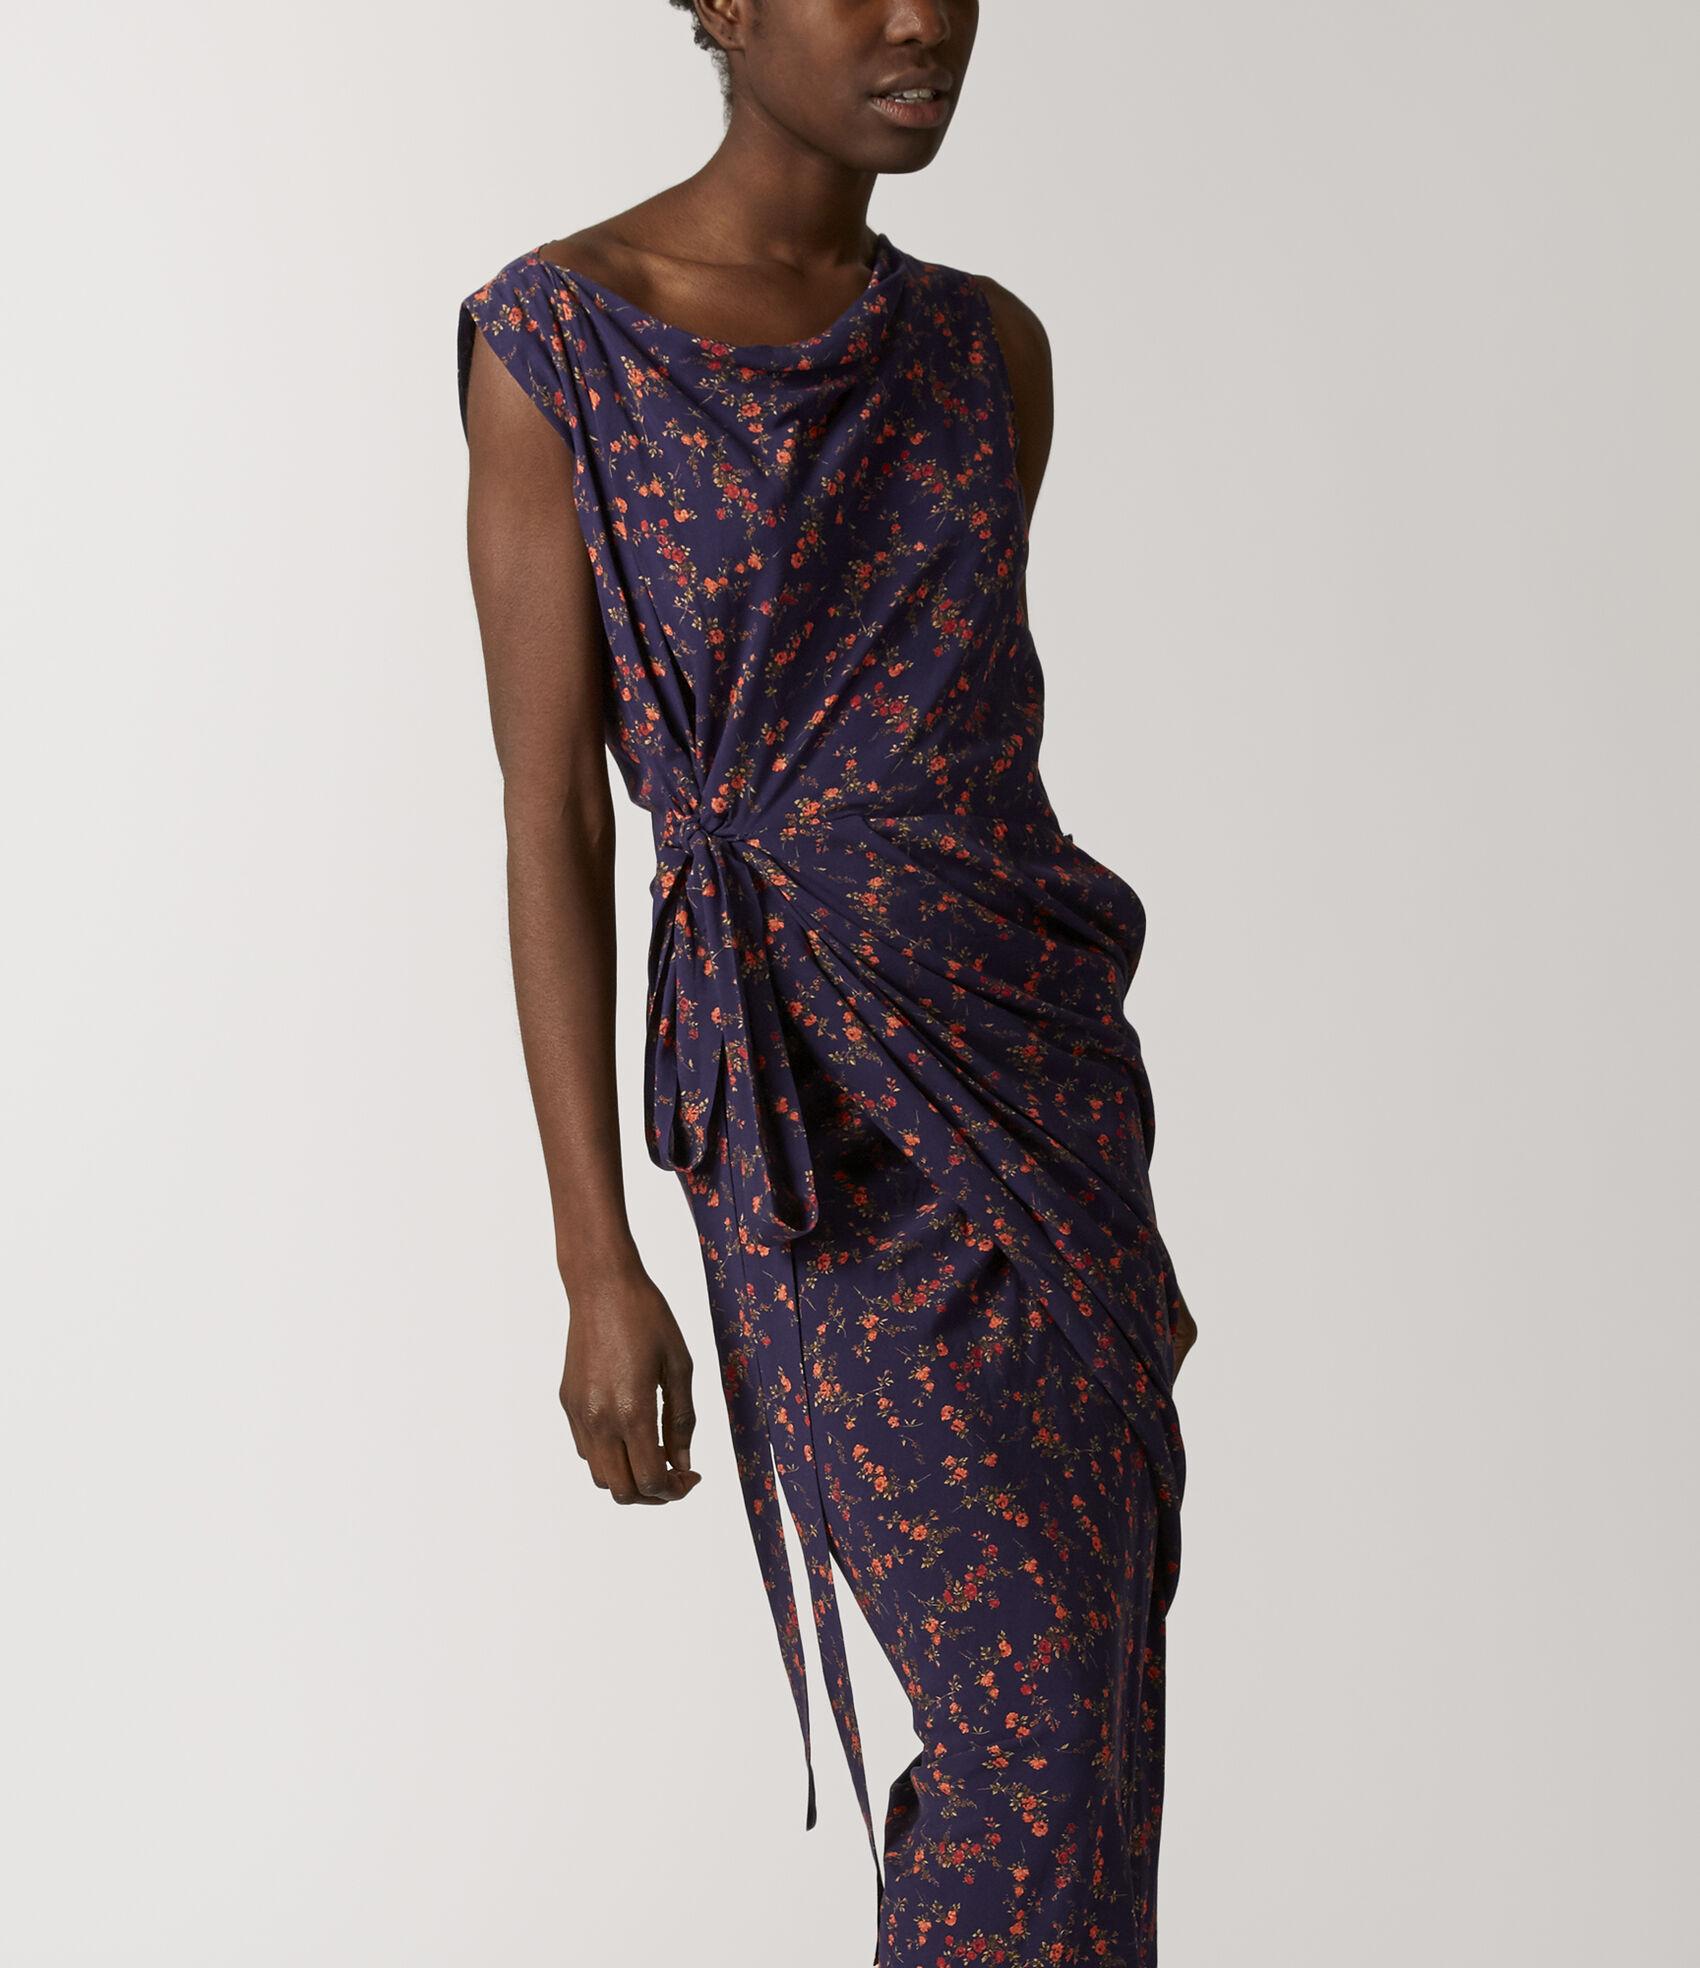 d4f6b17dd9a73 Vian Dress Multi | Women's Dresses | Vivienne Westwood